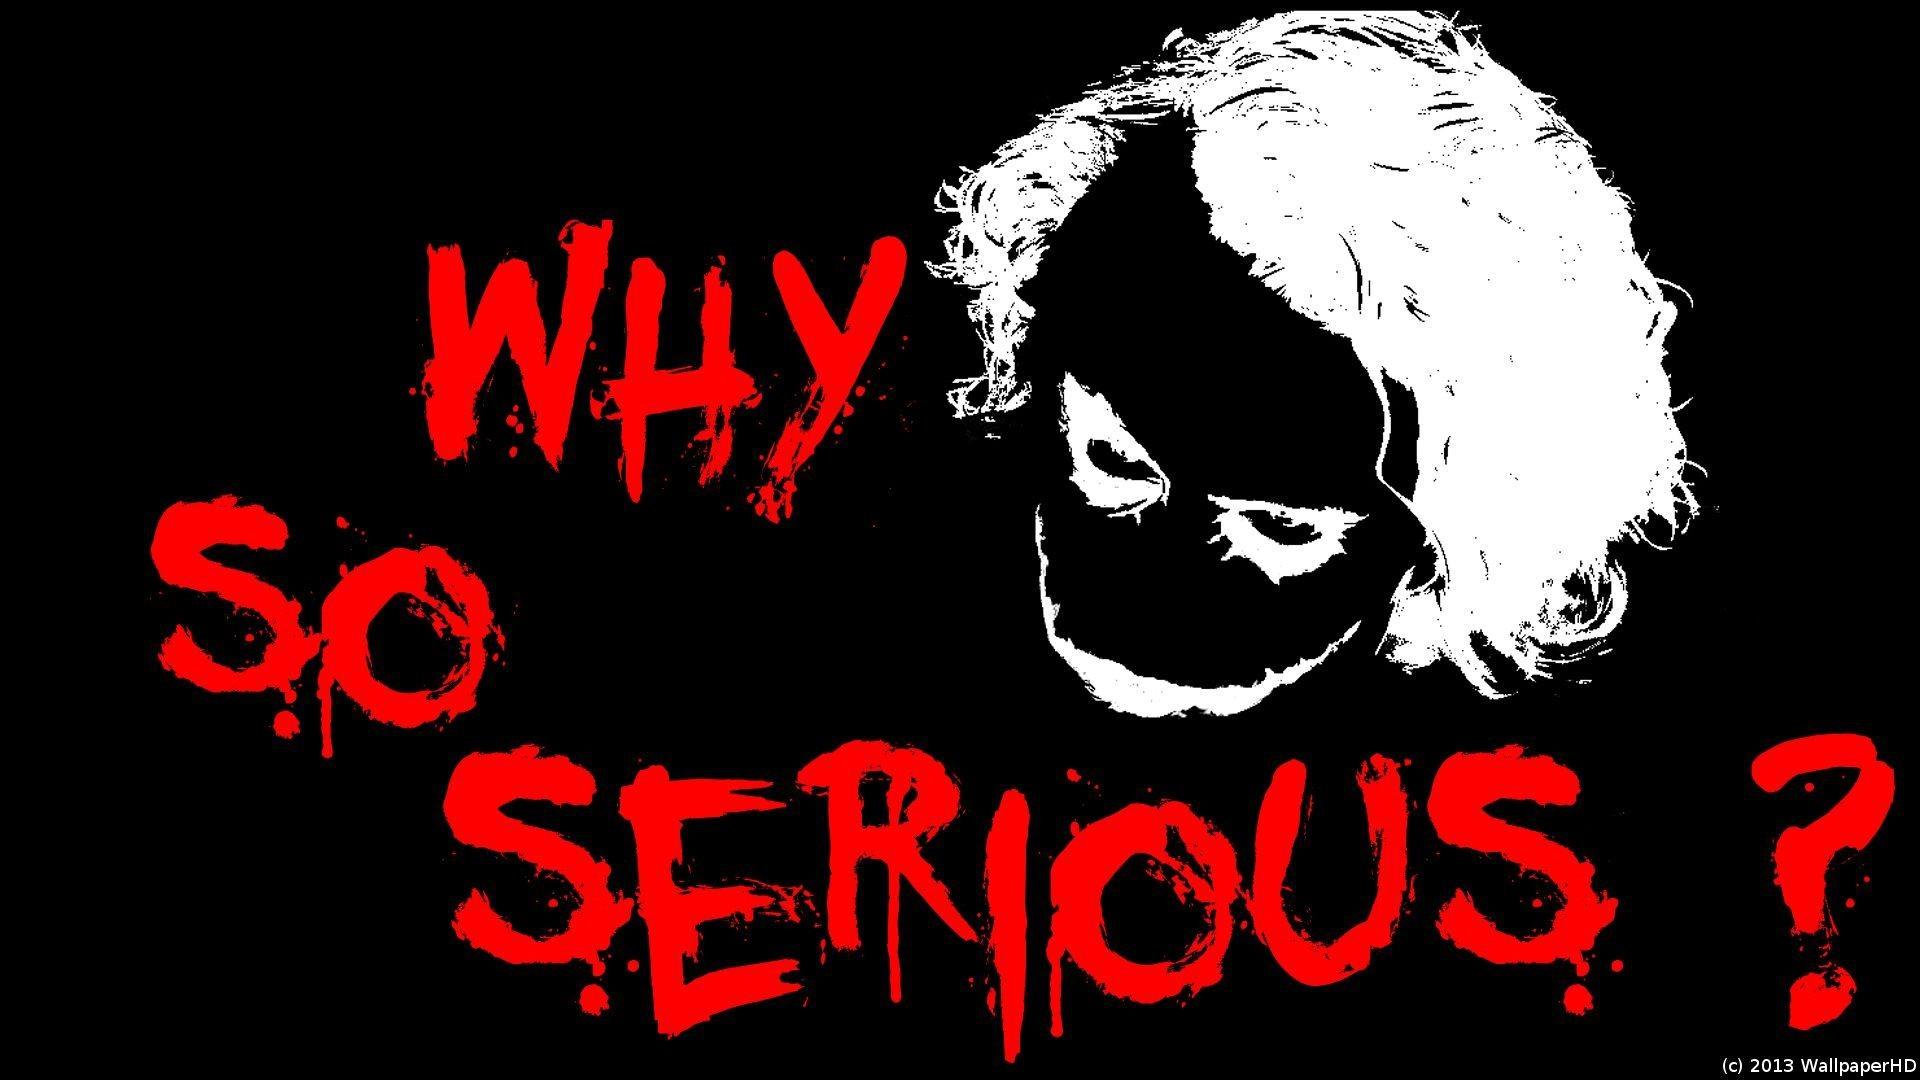 Joker Quotes Wallpaper Hd Joker Why So Serious Wallpaper 183 ①